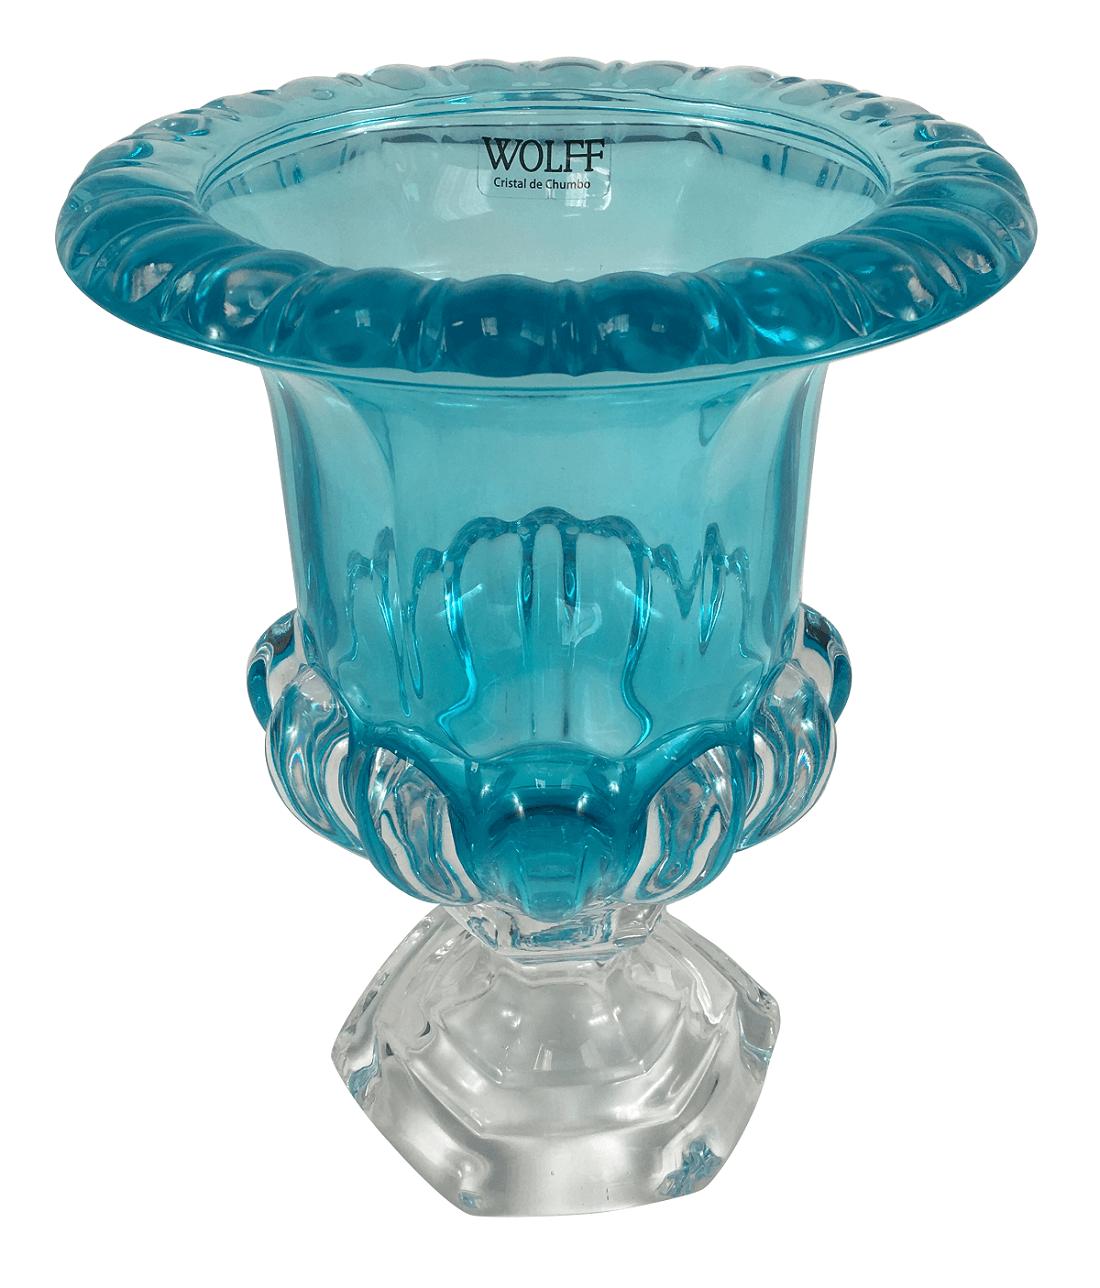 Lindo Vaso De Cristal Azul Turquesa 26cm